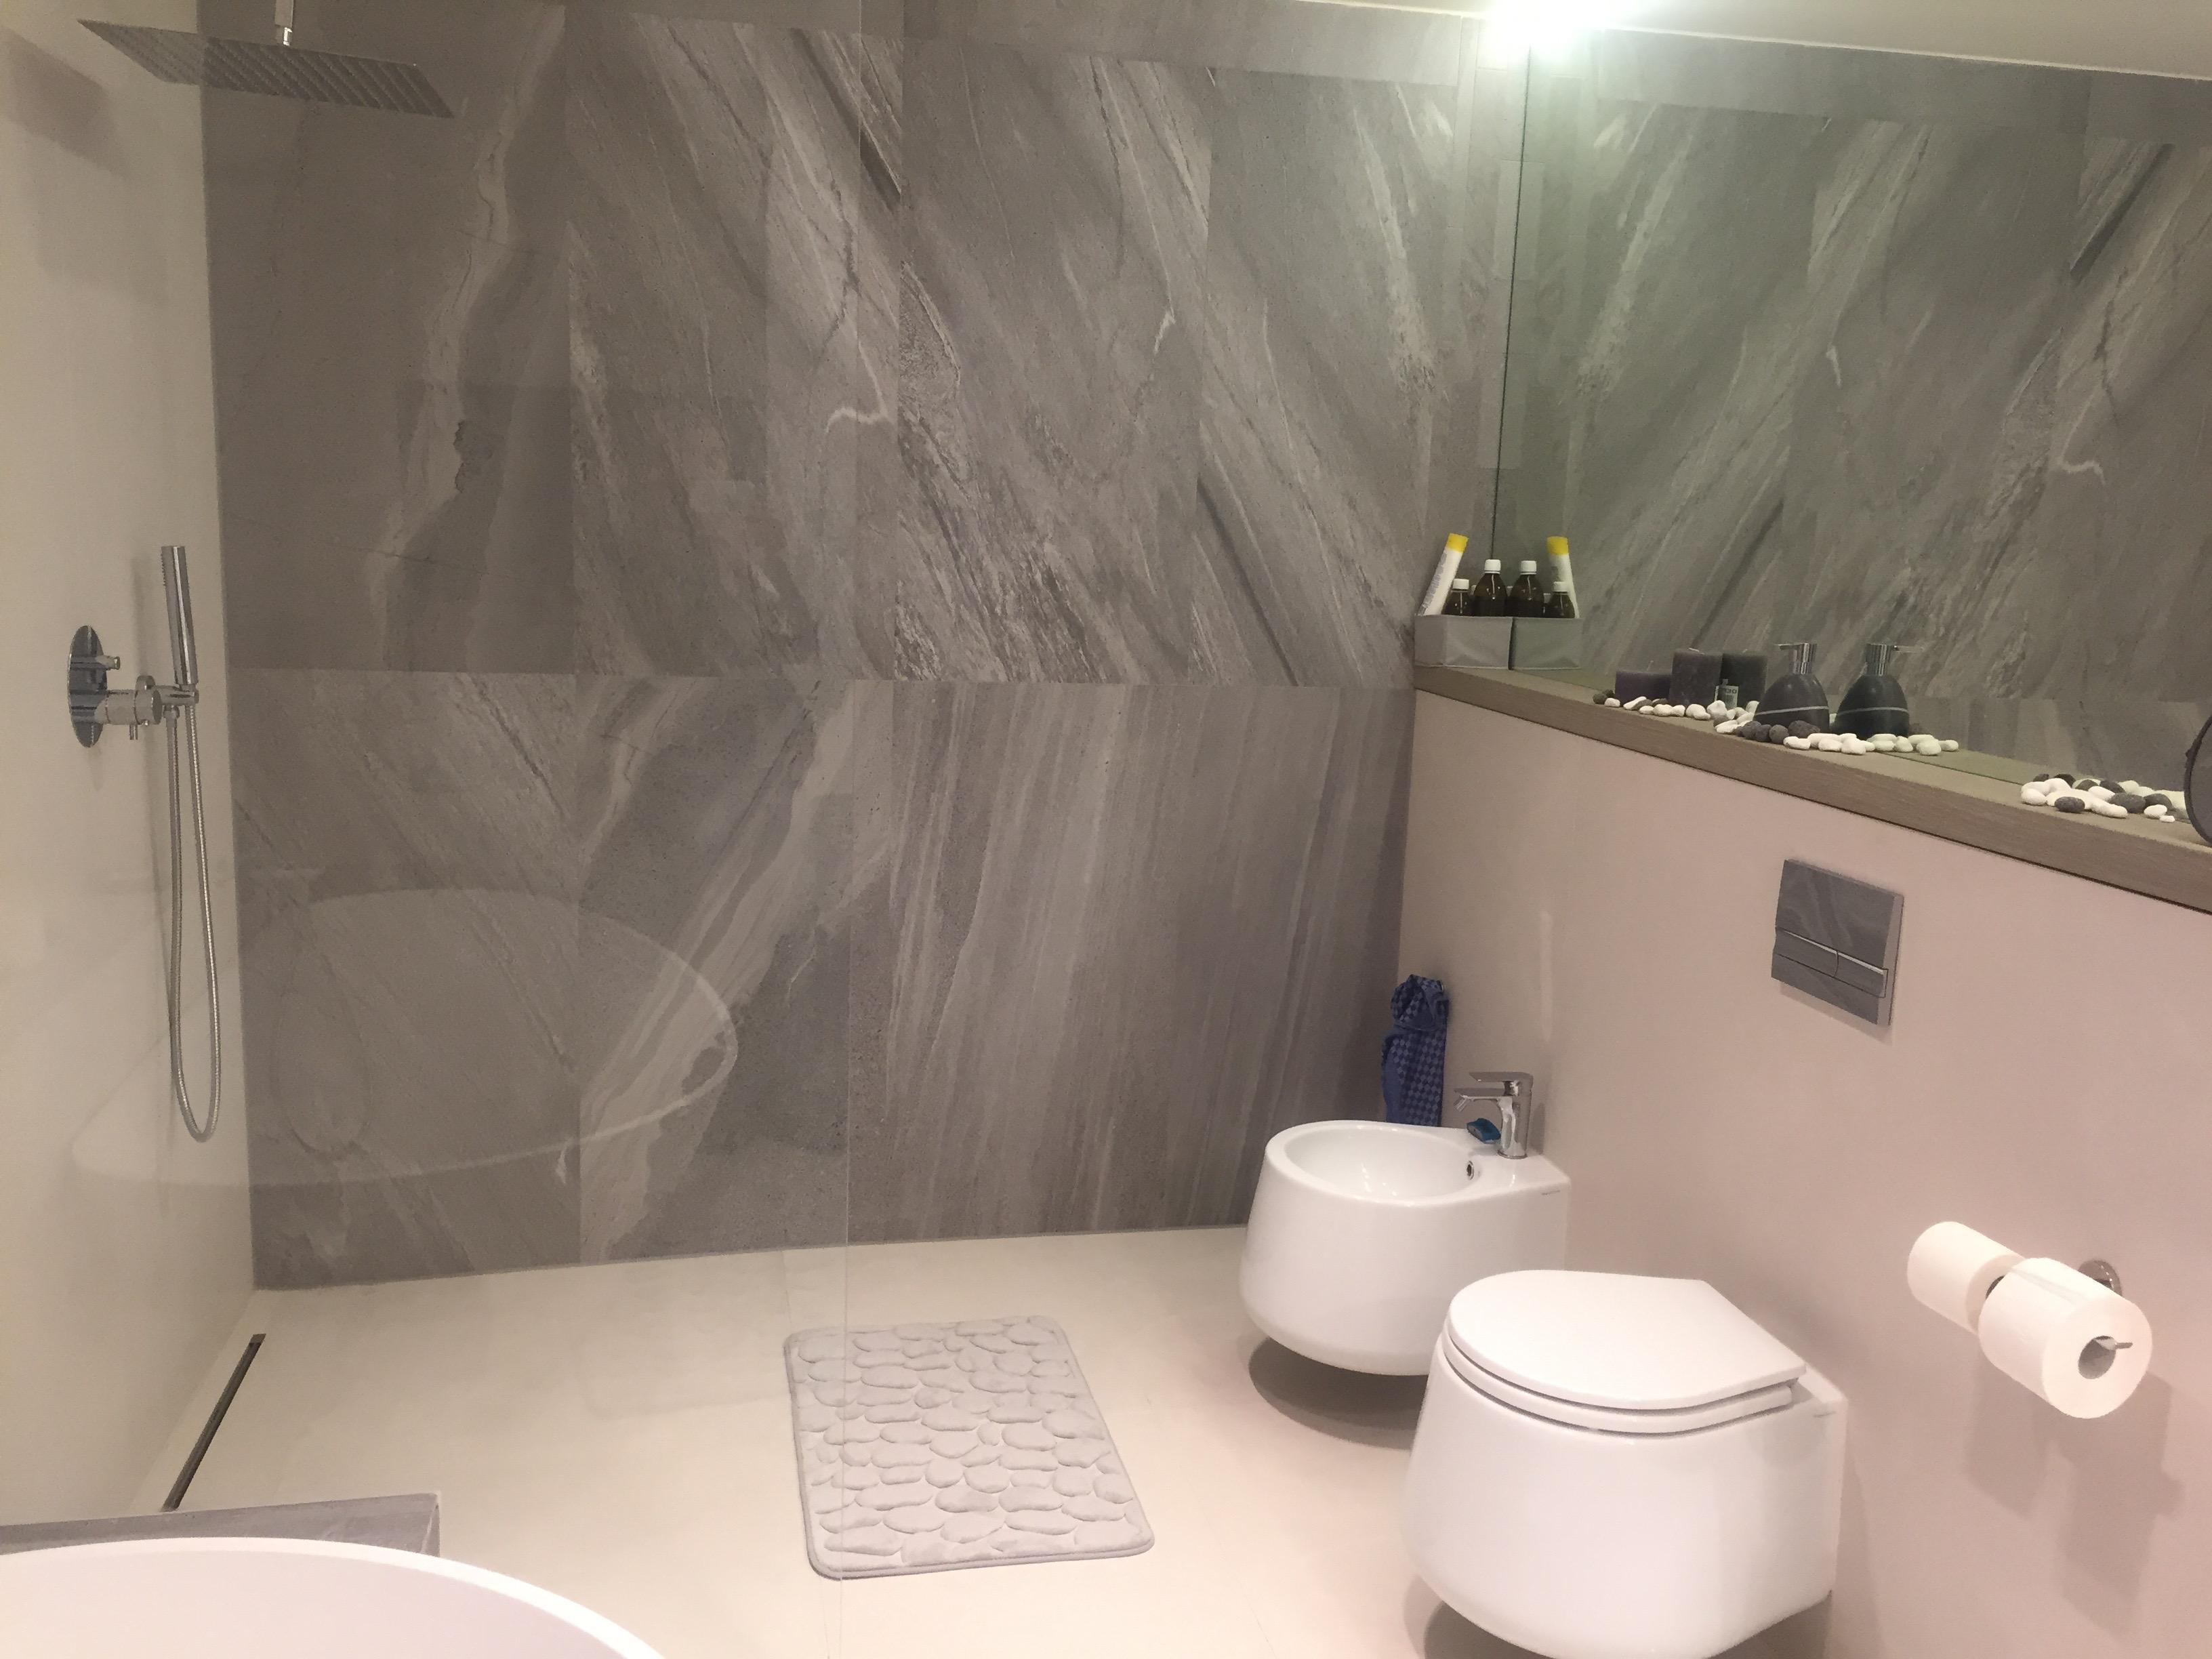 interiery toaleta